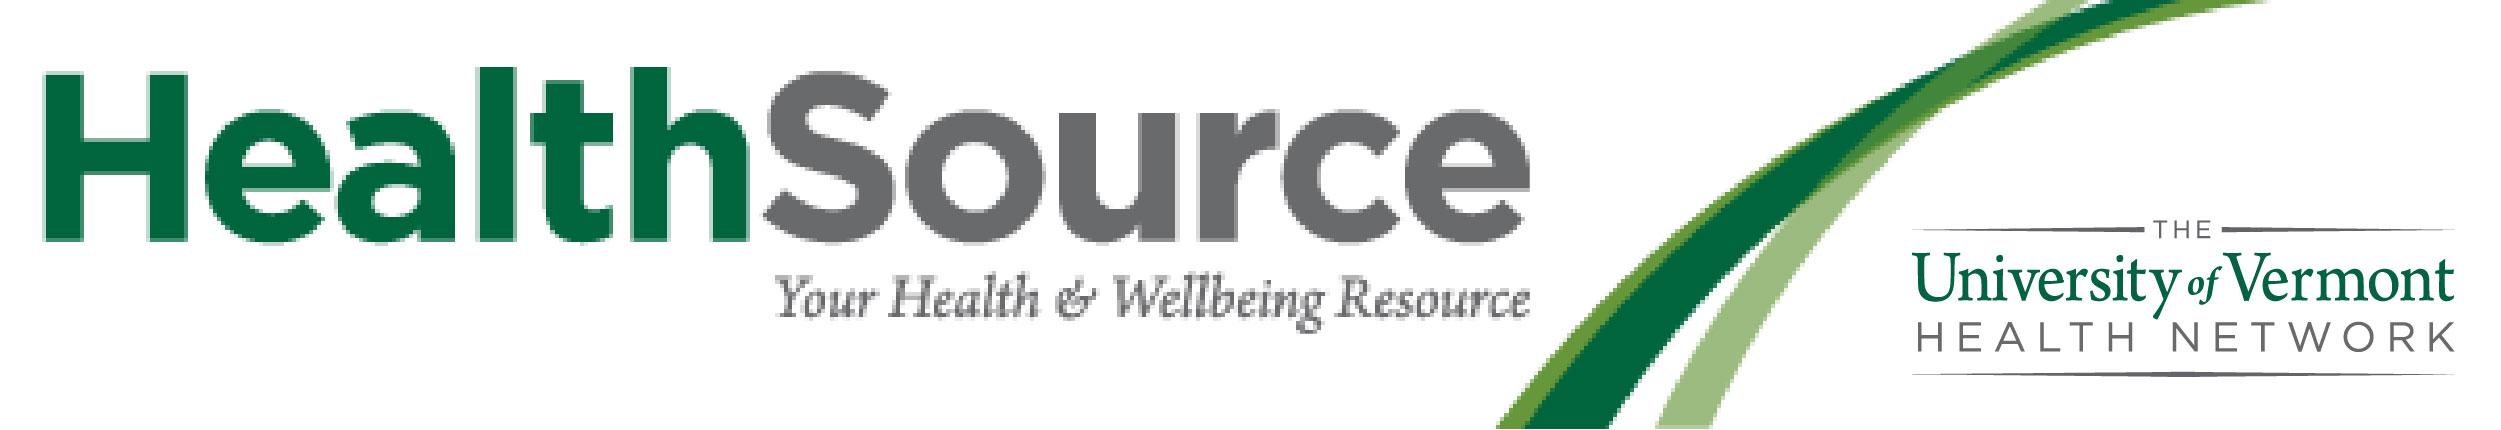 healthsource_header_UVMHN.jpg